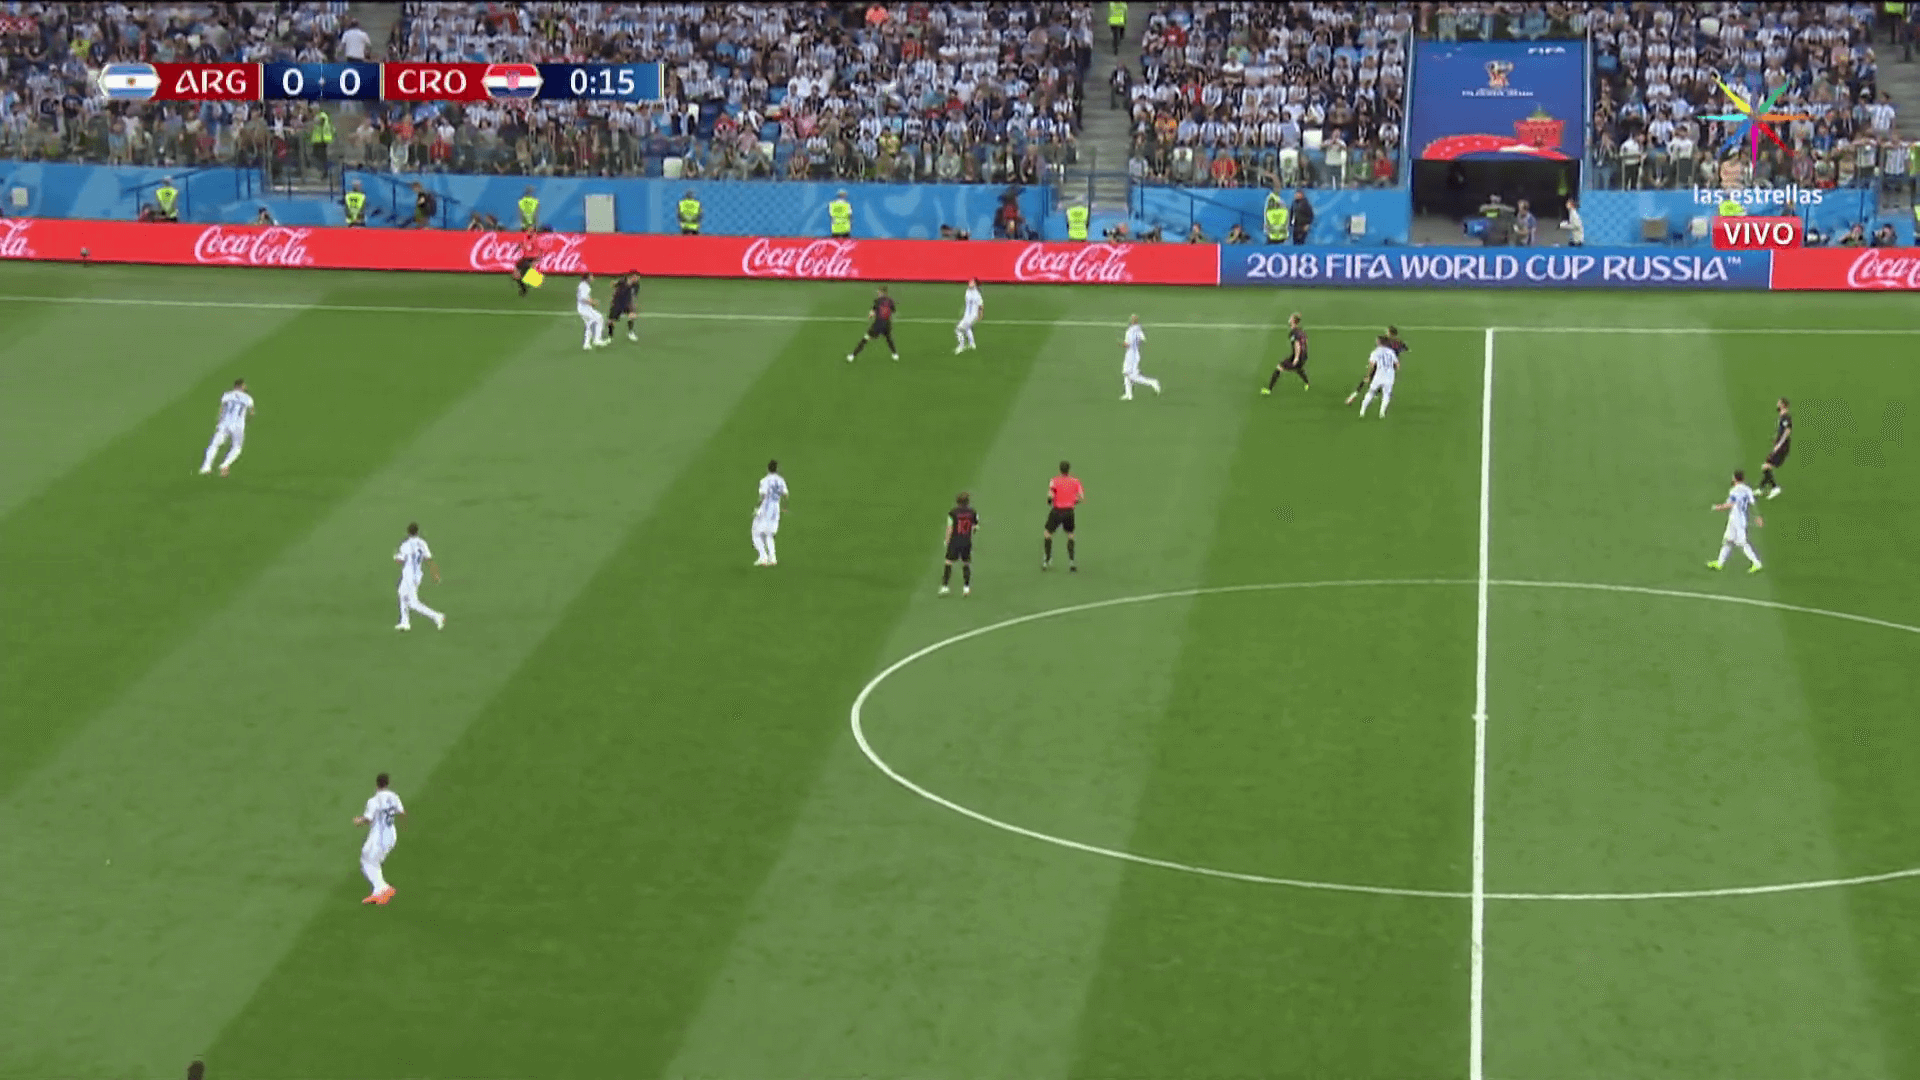 imagenes argentina vs croacia derrota